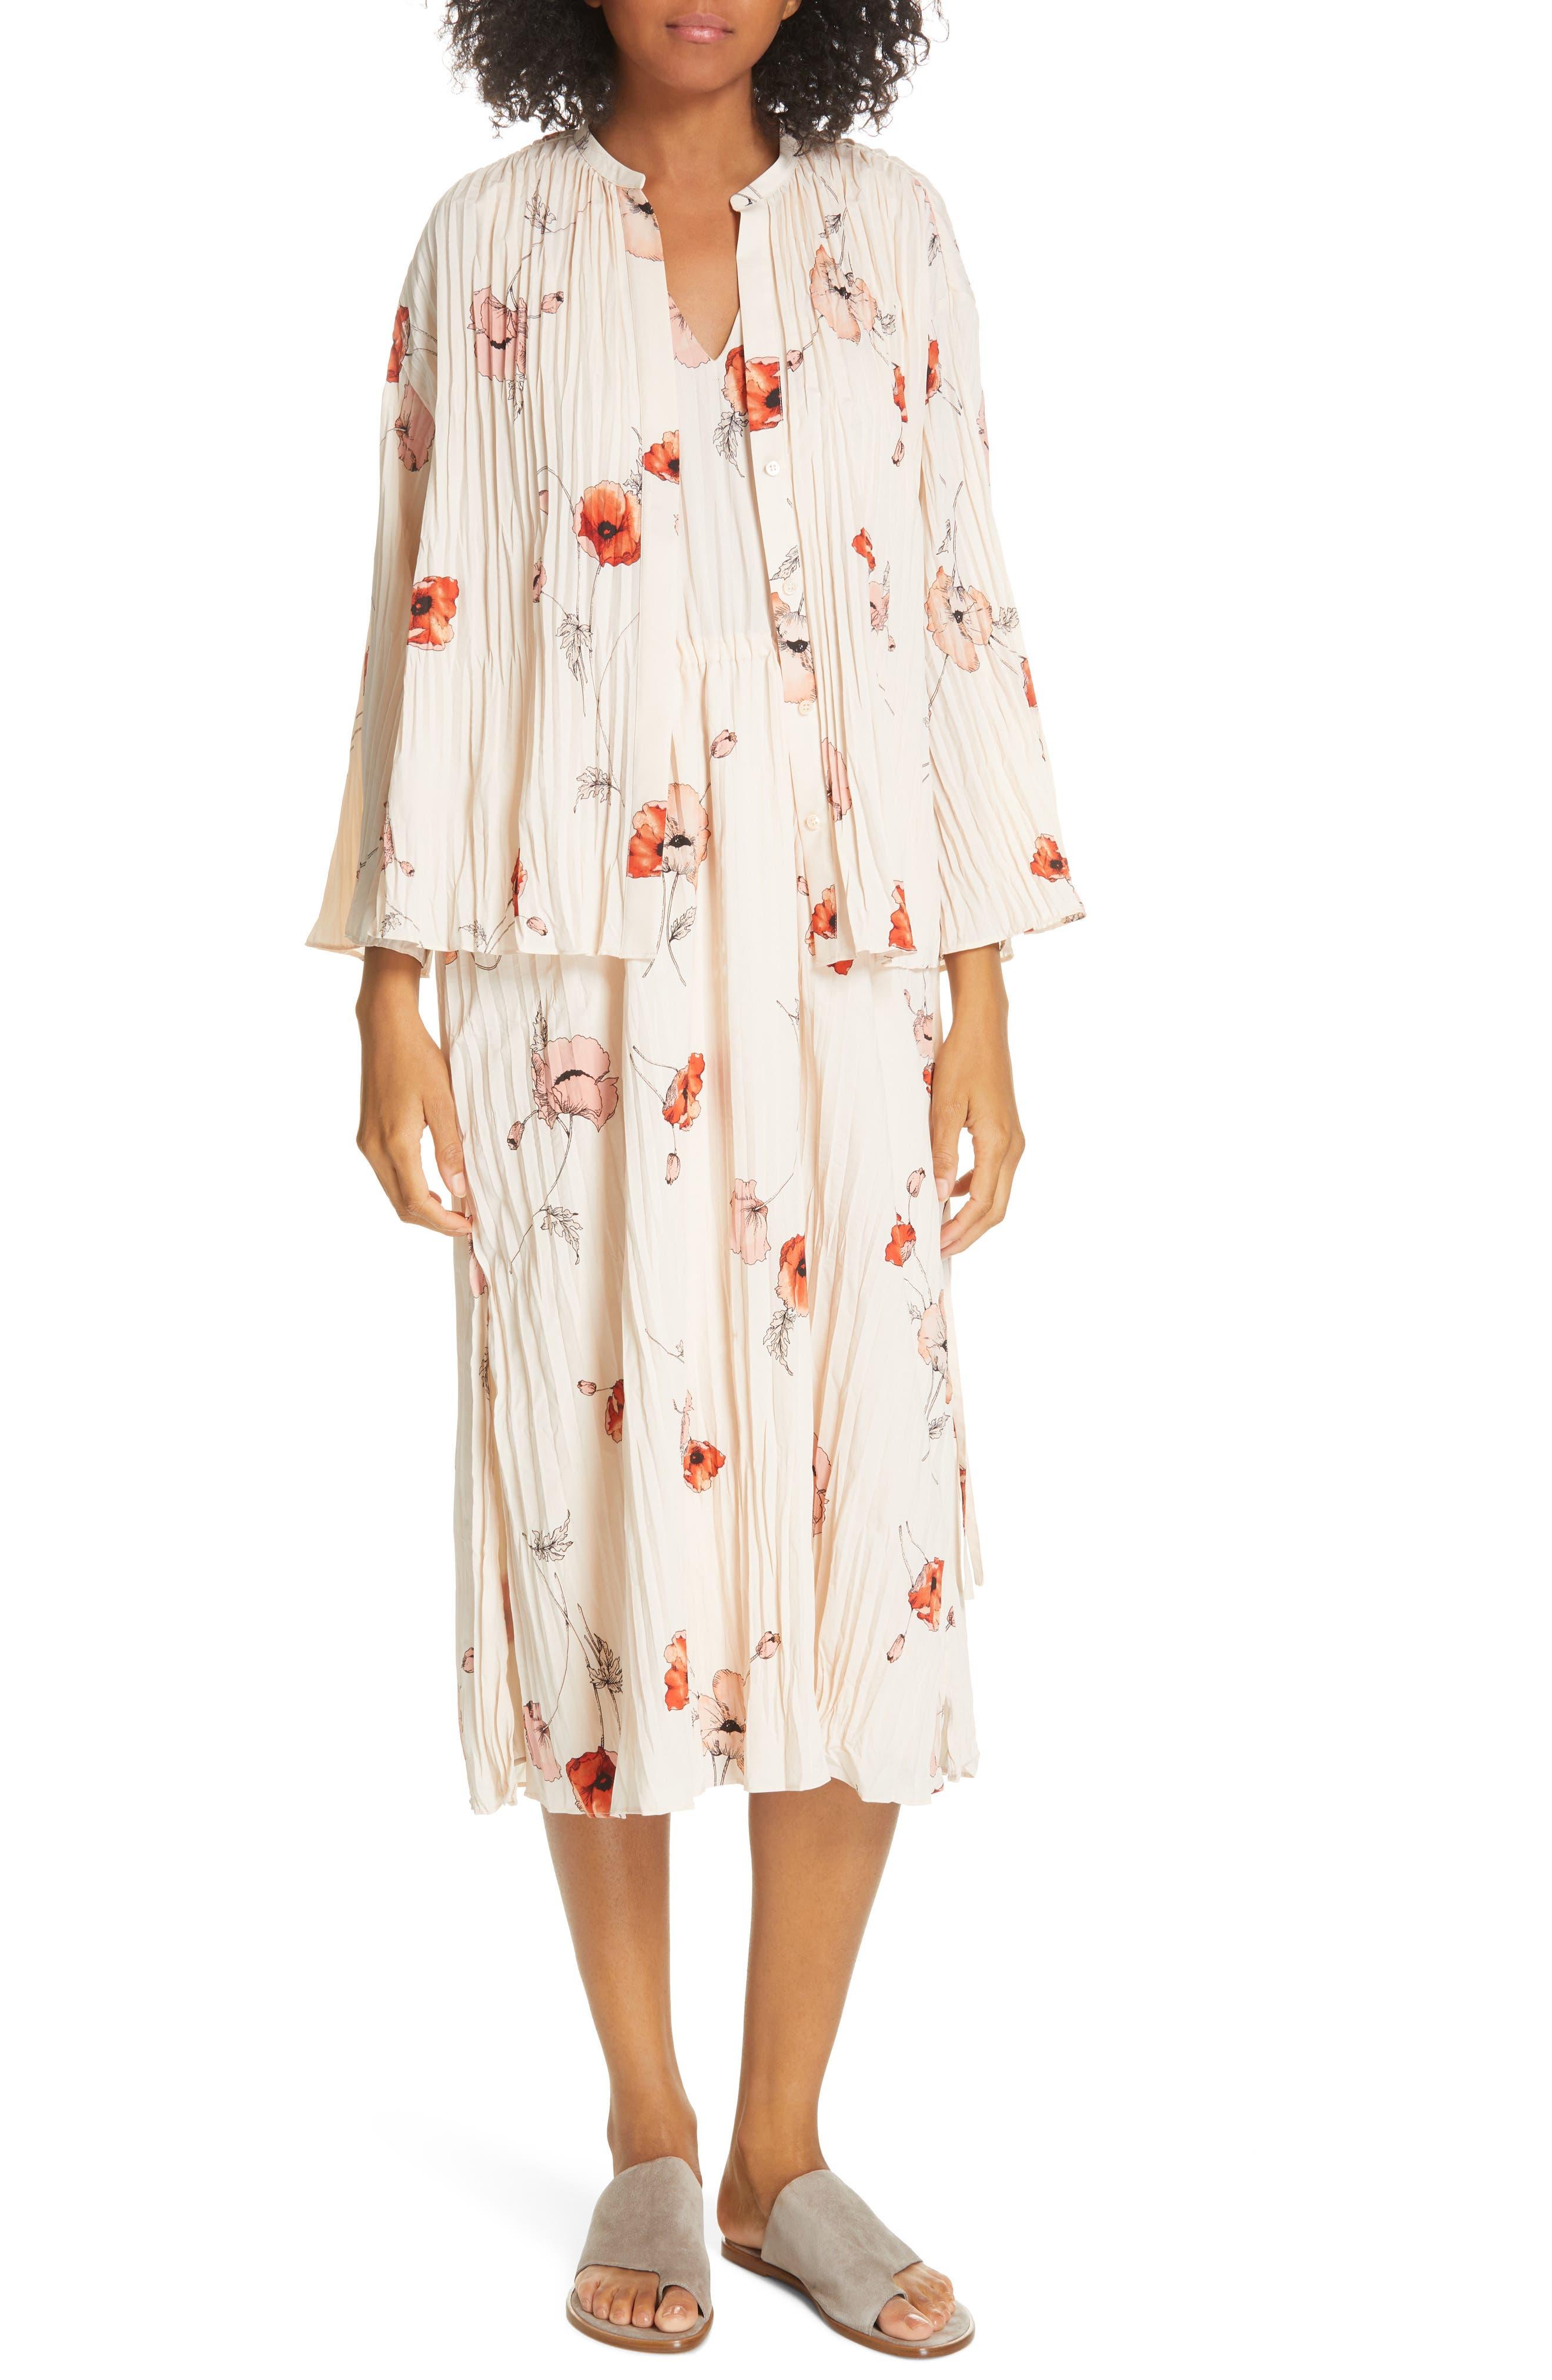 VINCE, Tossed Poppy Pleated Midi Dress, Alternate thumbnail 8, color, PALE BLUSH